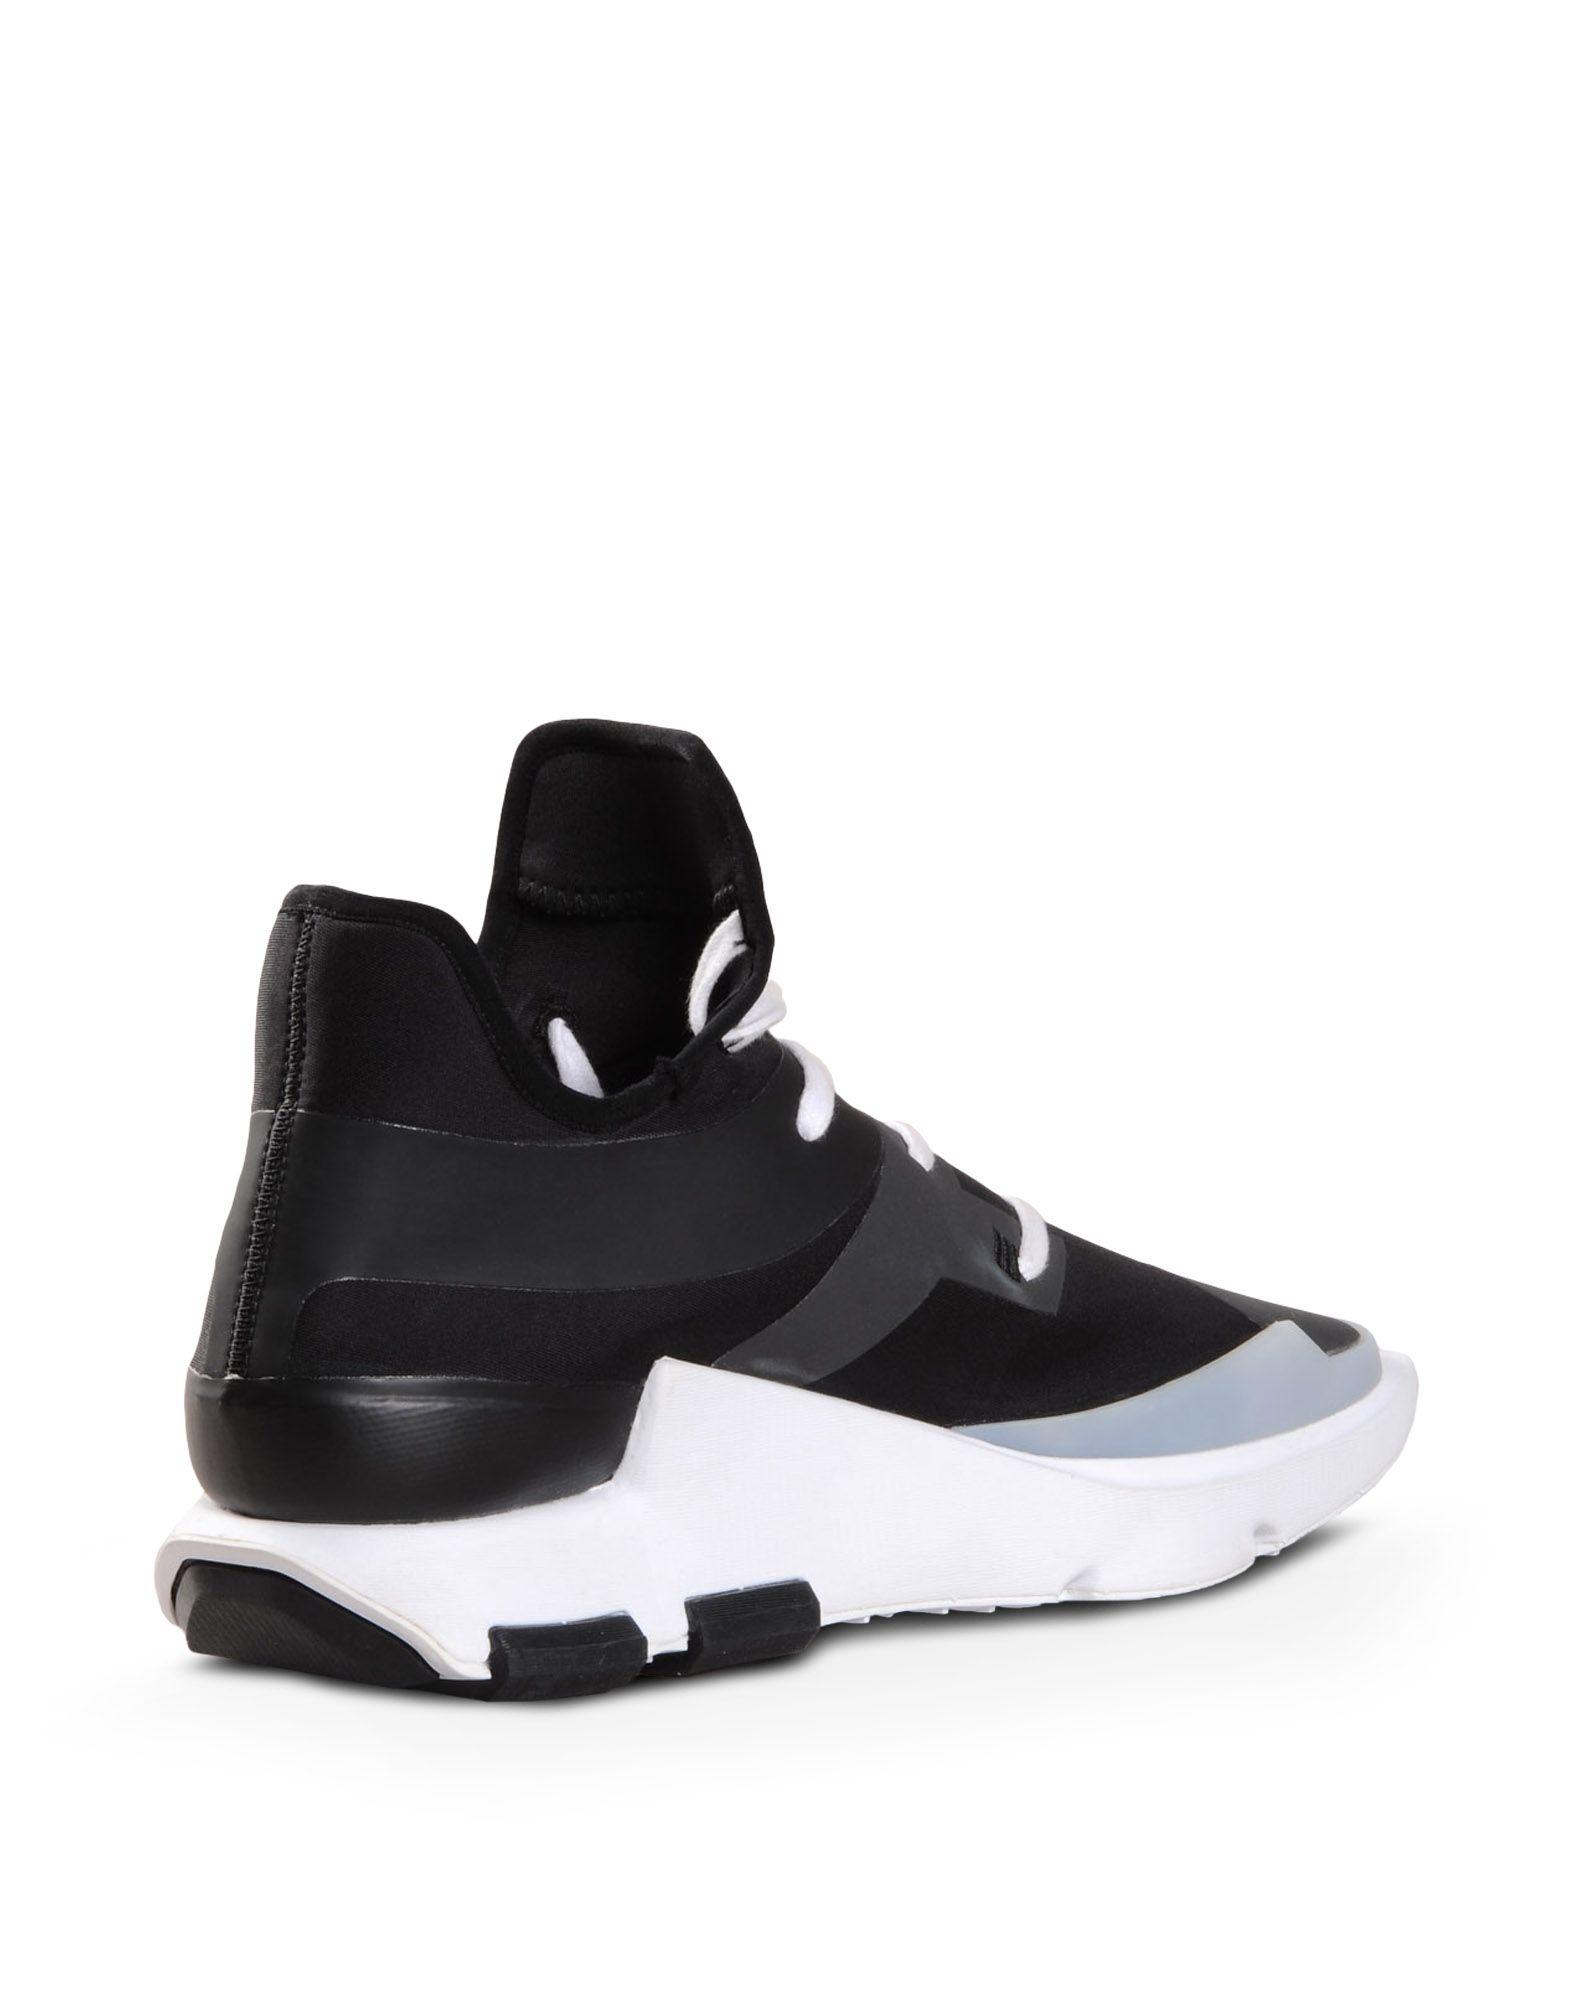 brand new b961b 09ae7 ... Y-3 Y-3 NOCI LOW Sneakers Man d ...